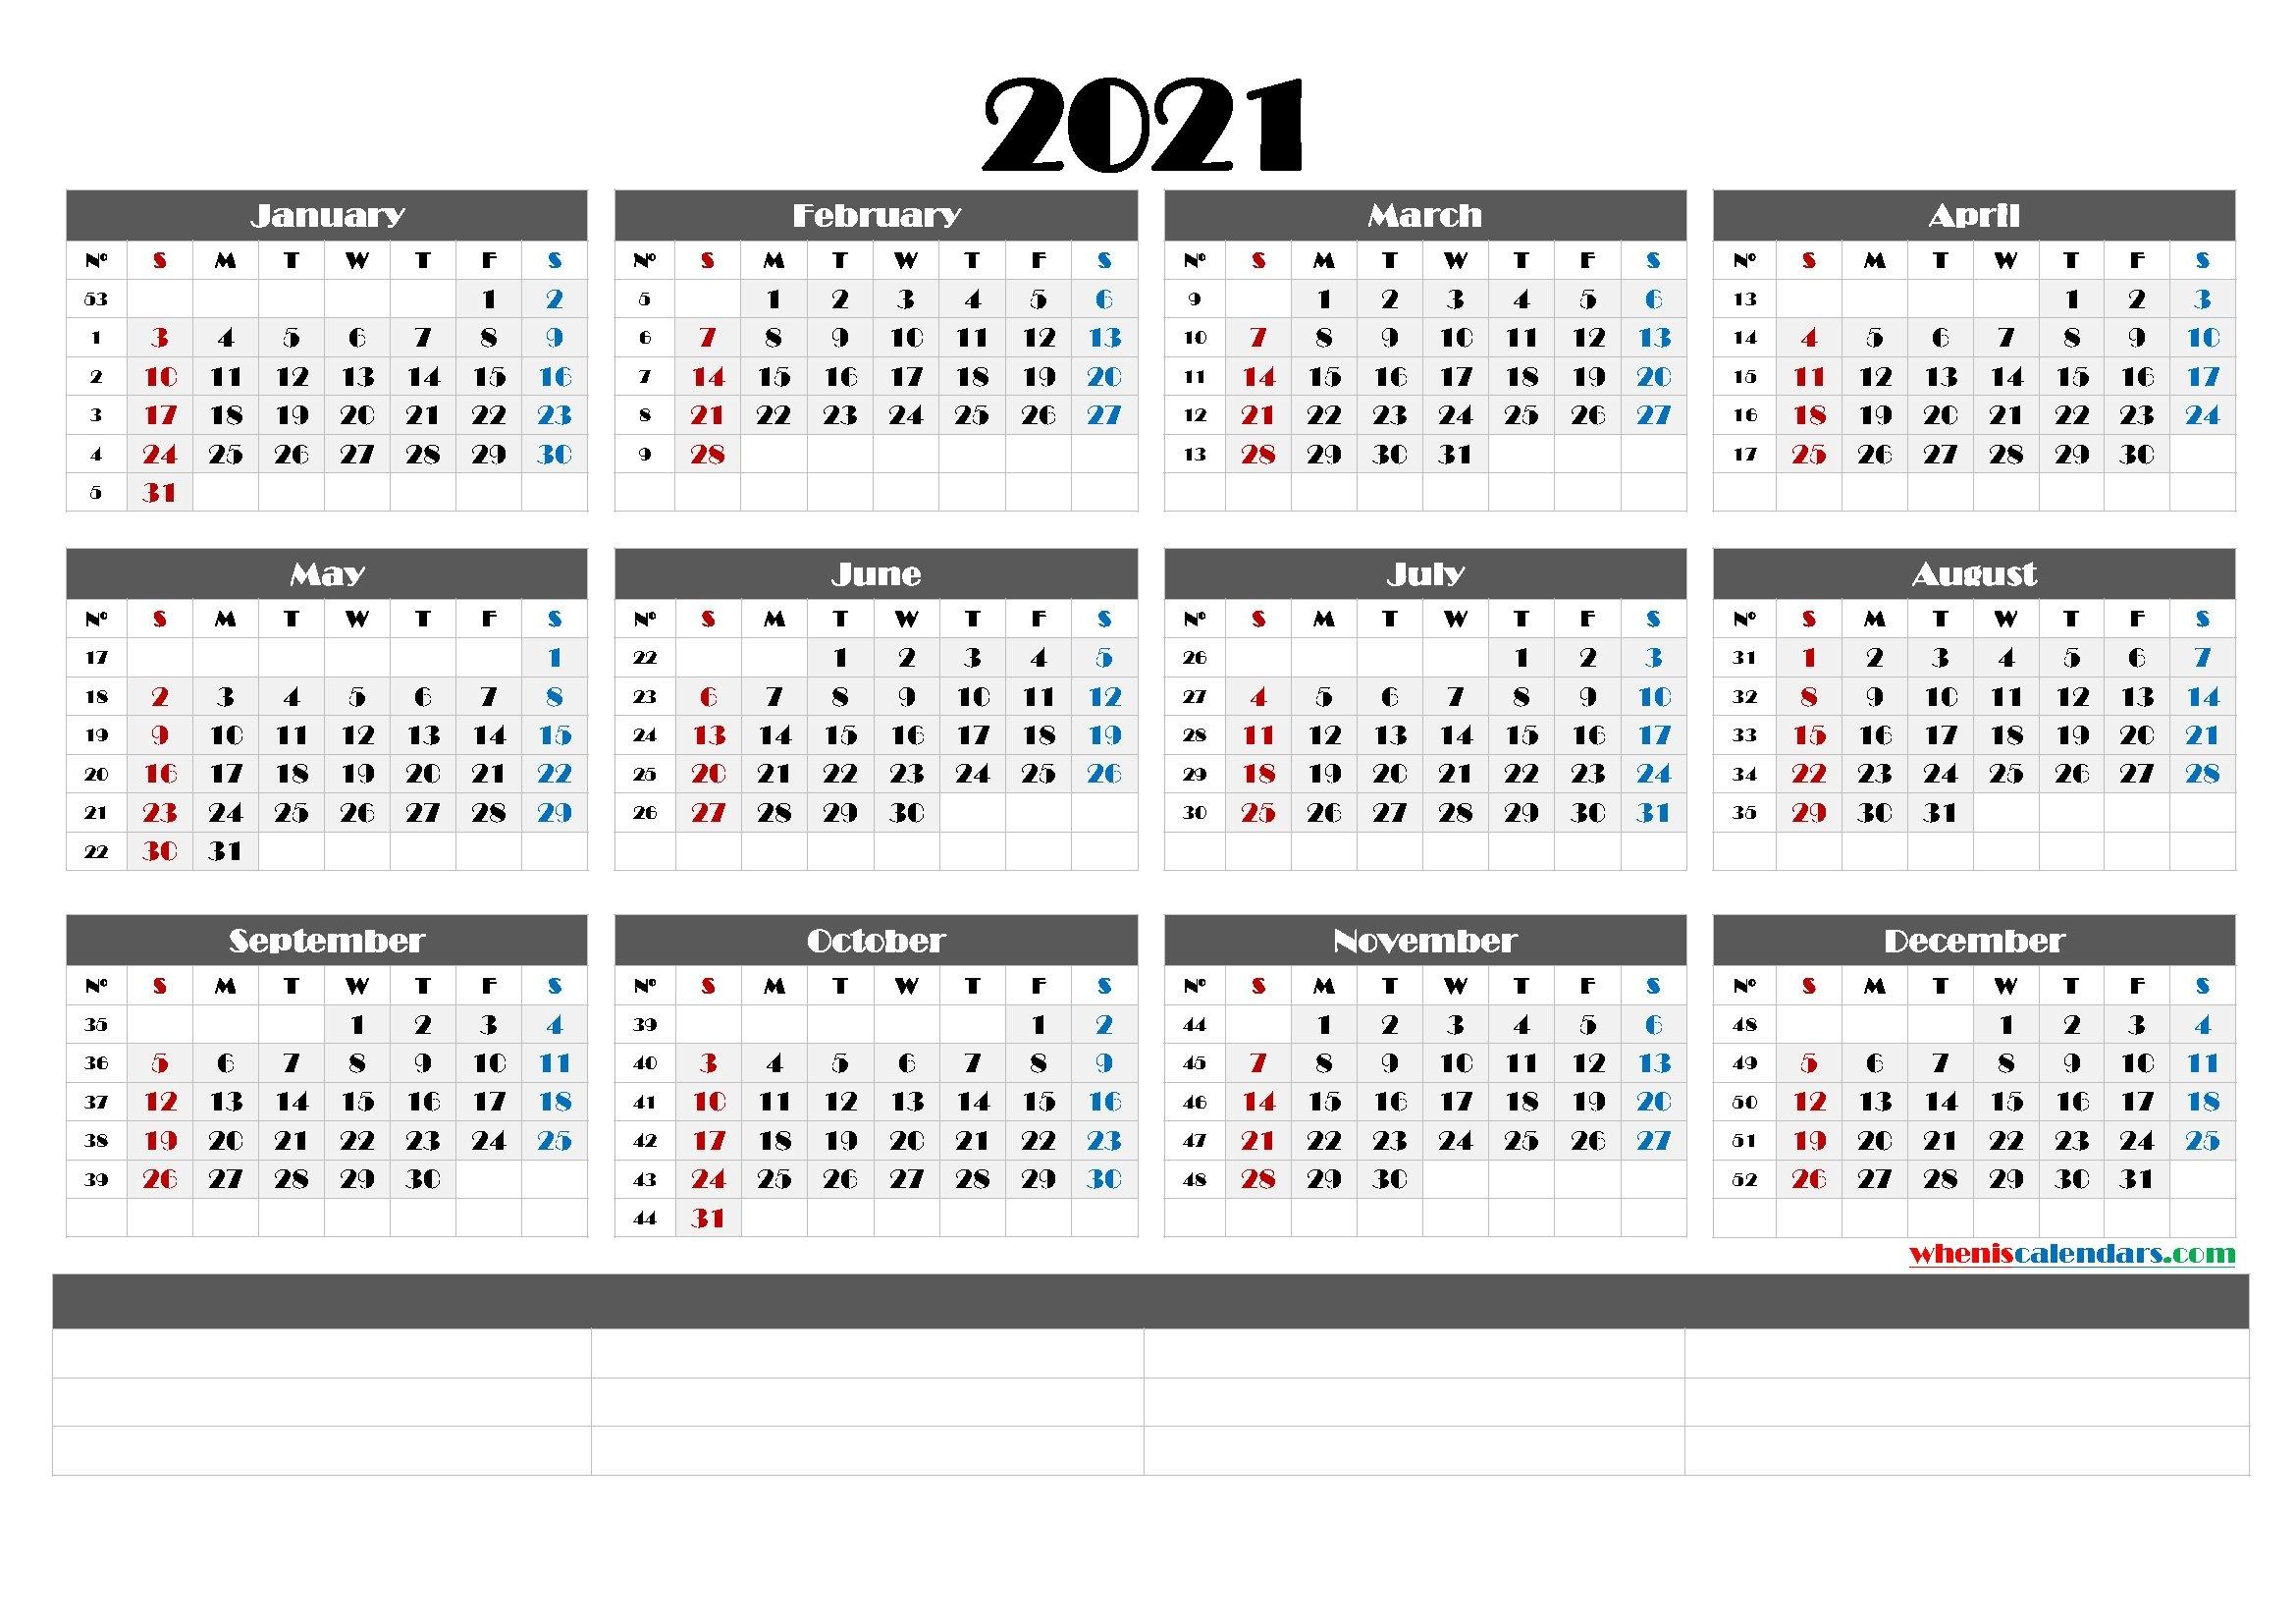 2021 Printable Yearly Calendar With Week Numbers (6 Templates) for Calendar For Year 2021 With Weeks Numbered